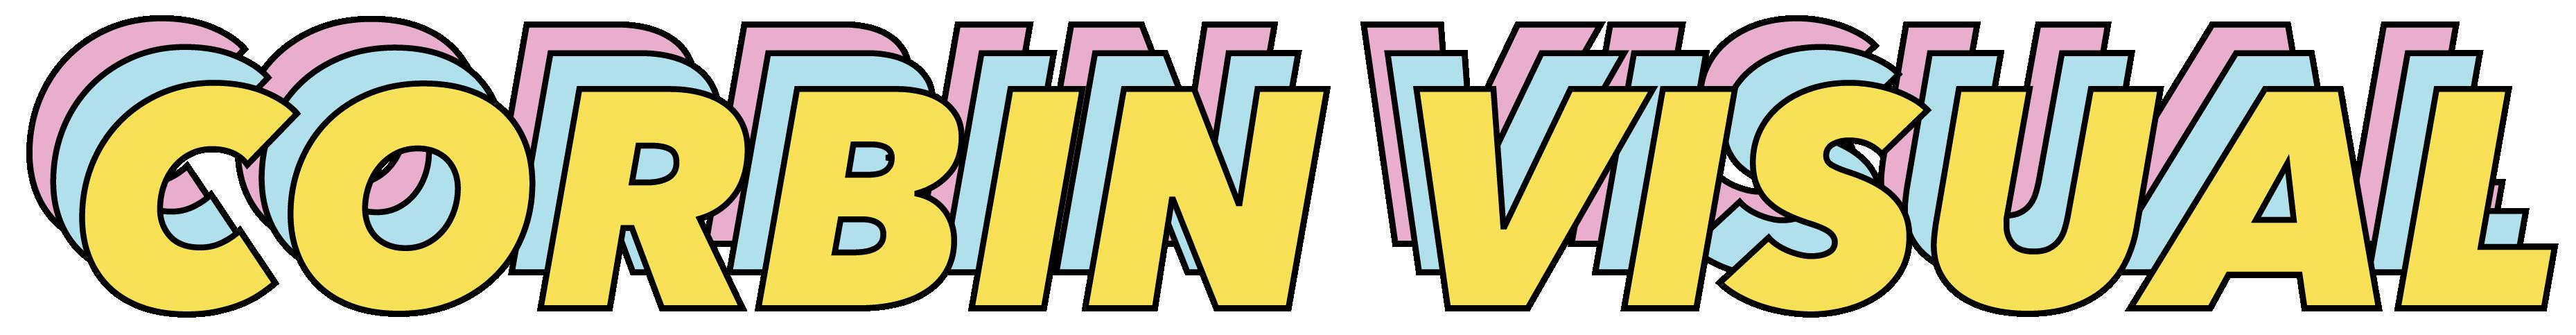 corbin visual logo